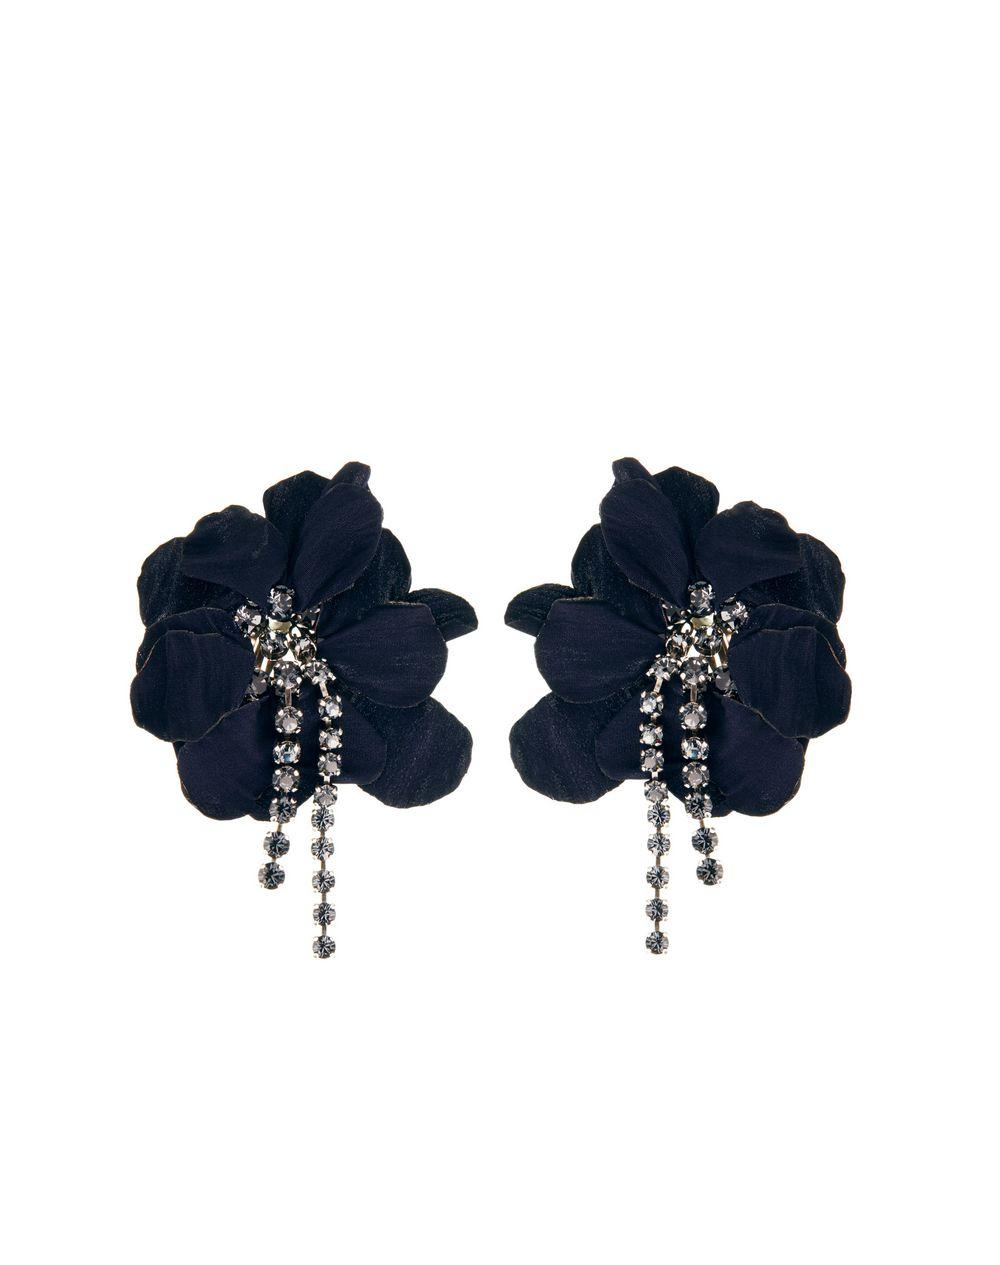 Gina Clip Earrings